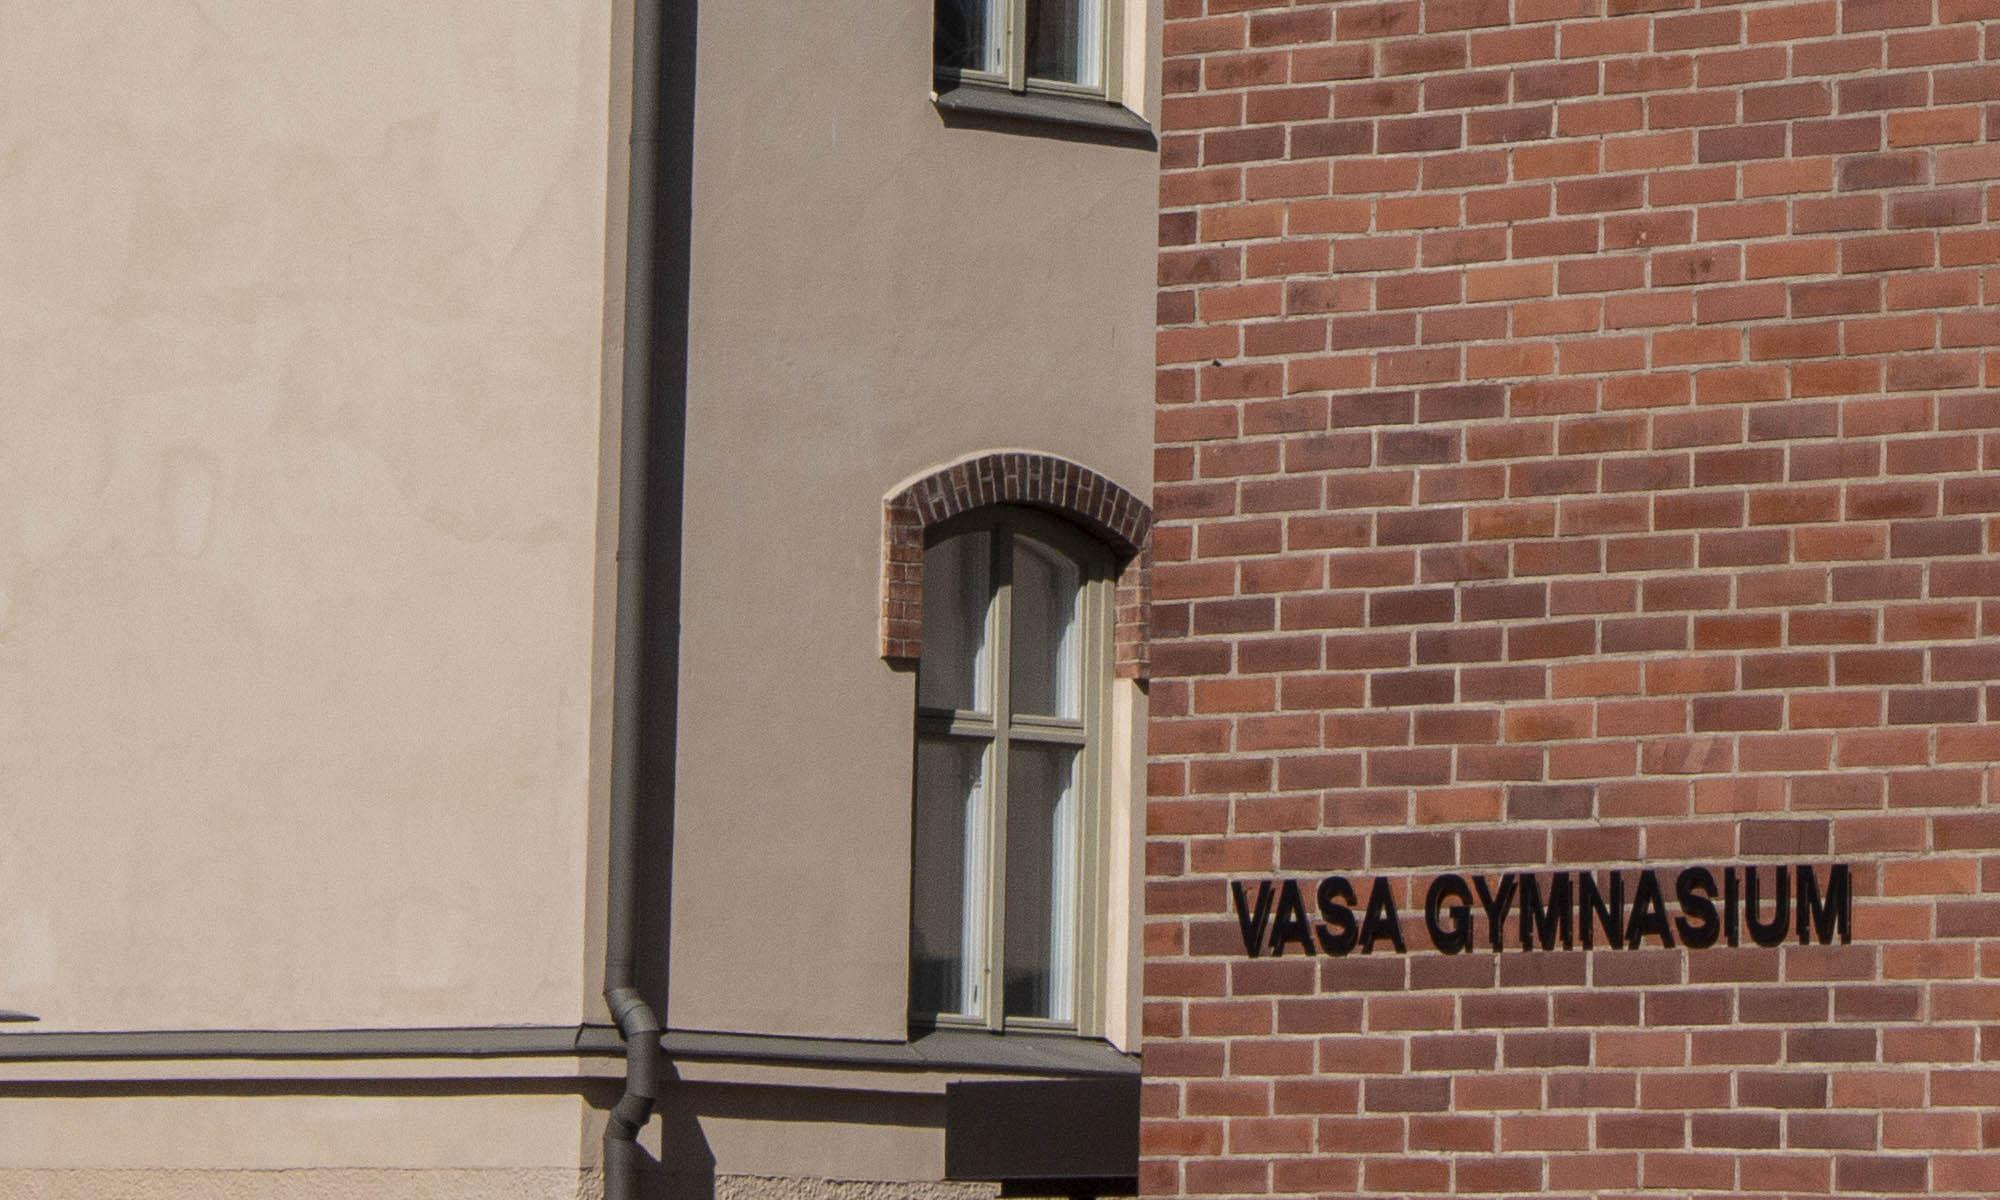 Vasa gymnasium